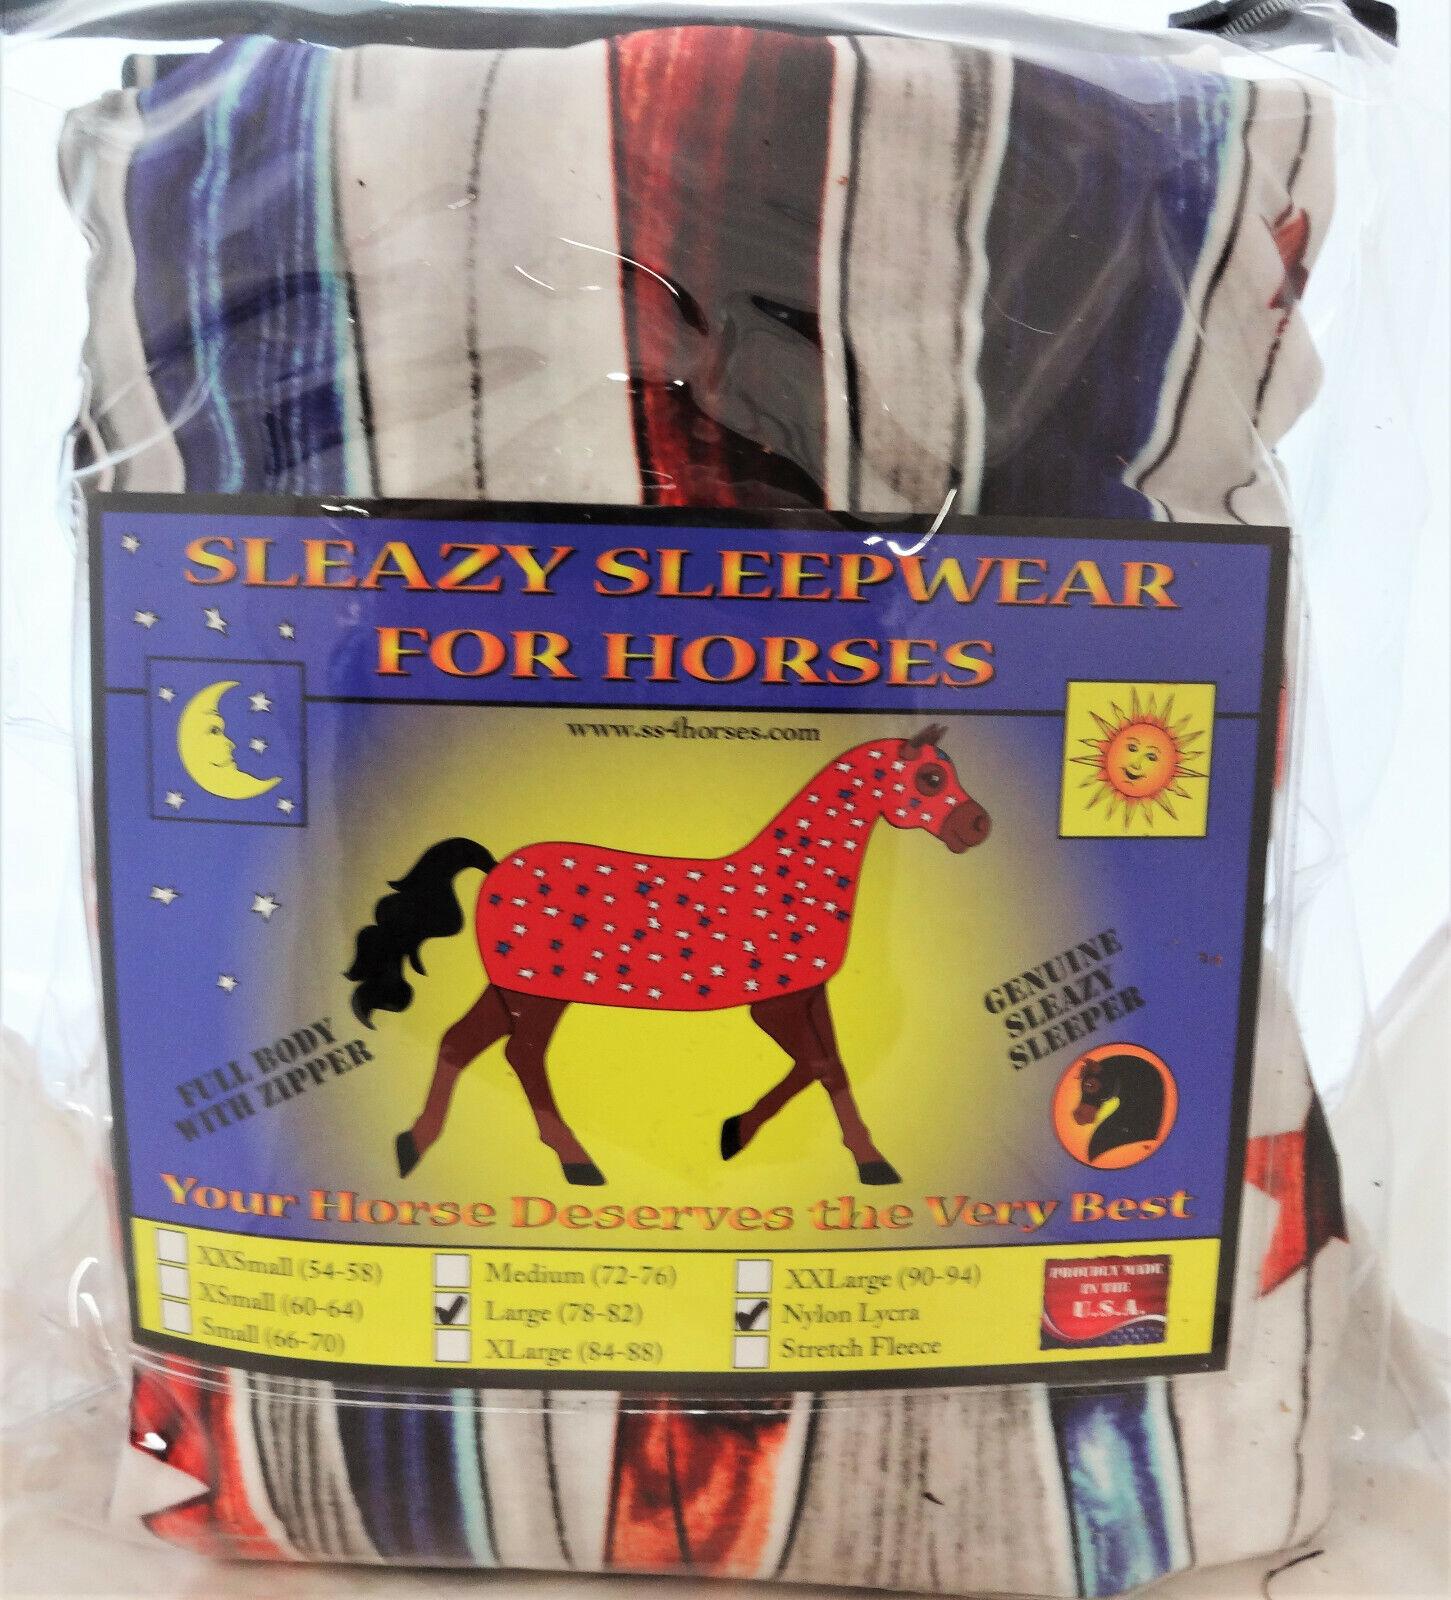 Patriot Sleazy Sleepwear Horses Full Body Sheet Stretch Lycra Größes Stars Stripe